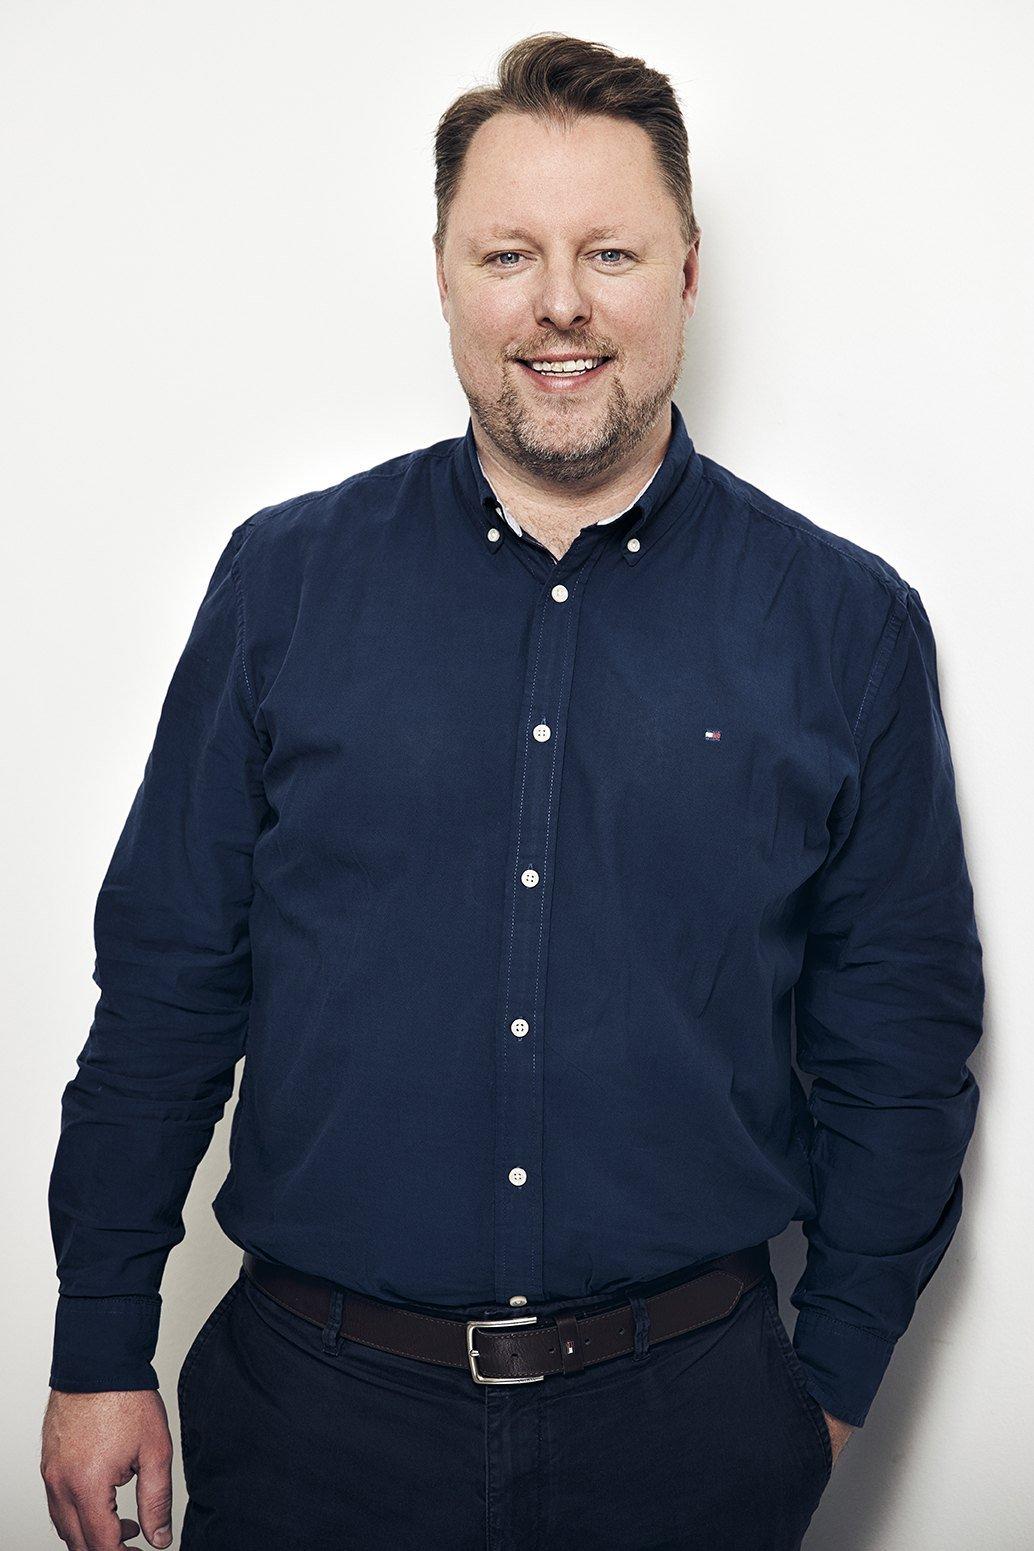 Mads Jespersen